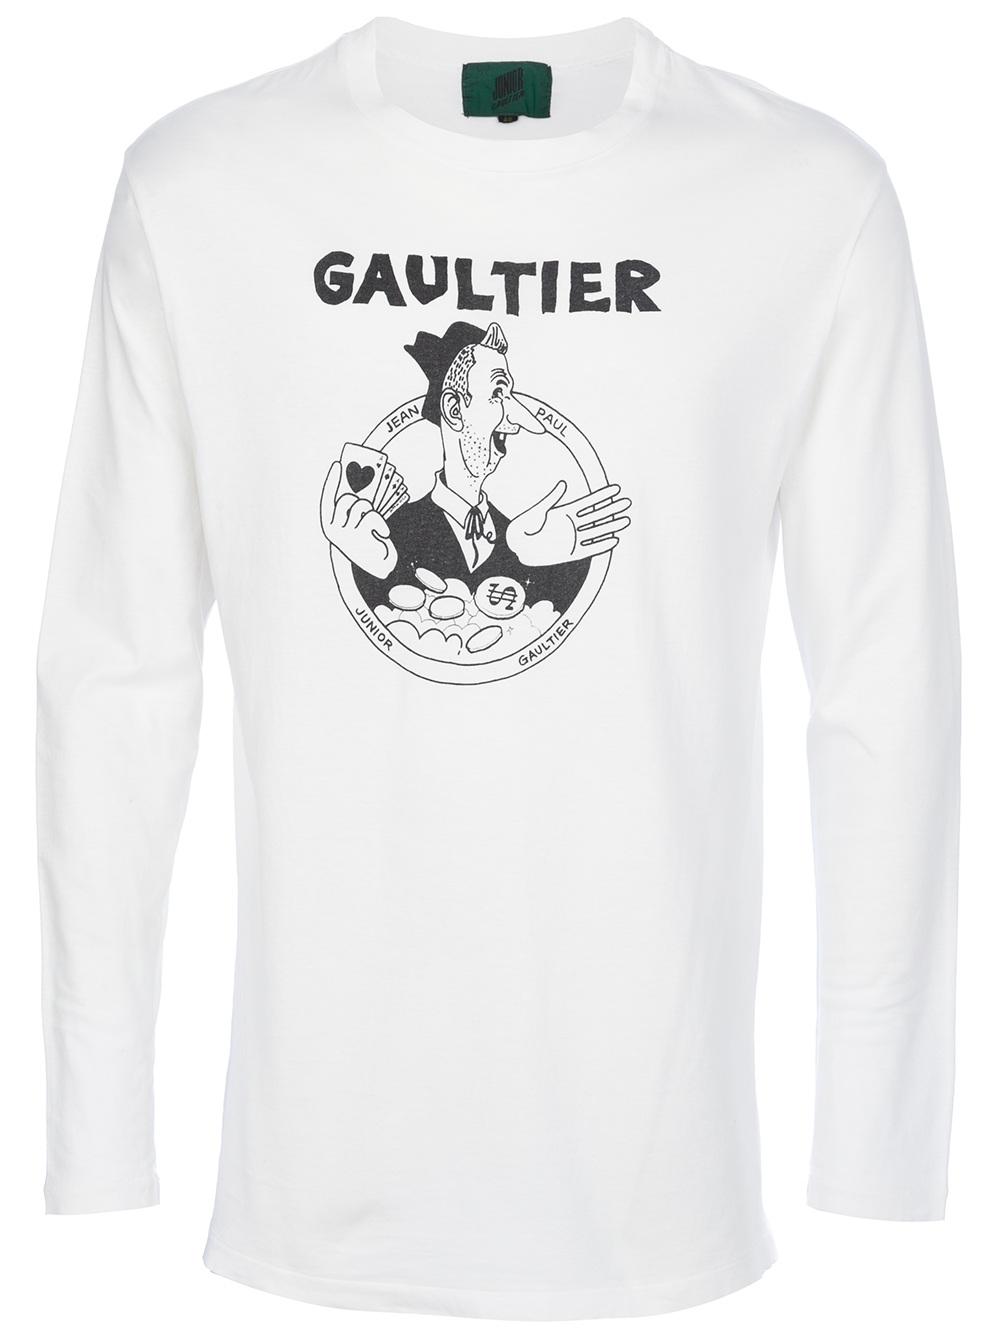 Junior Gaultier printed long sleeve t-shirt